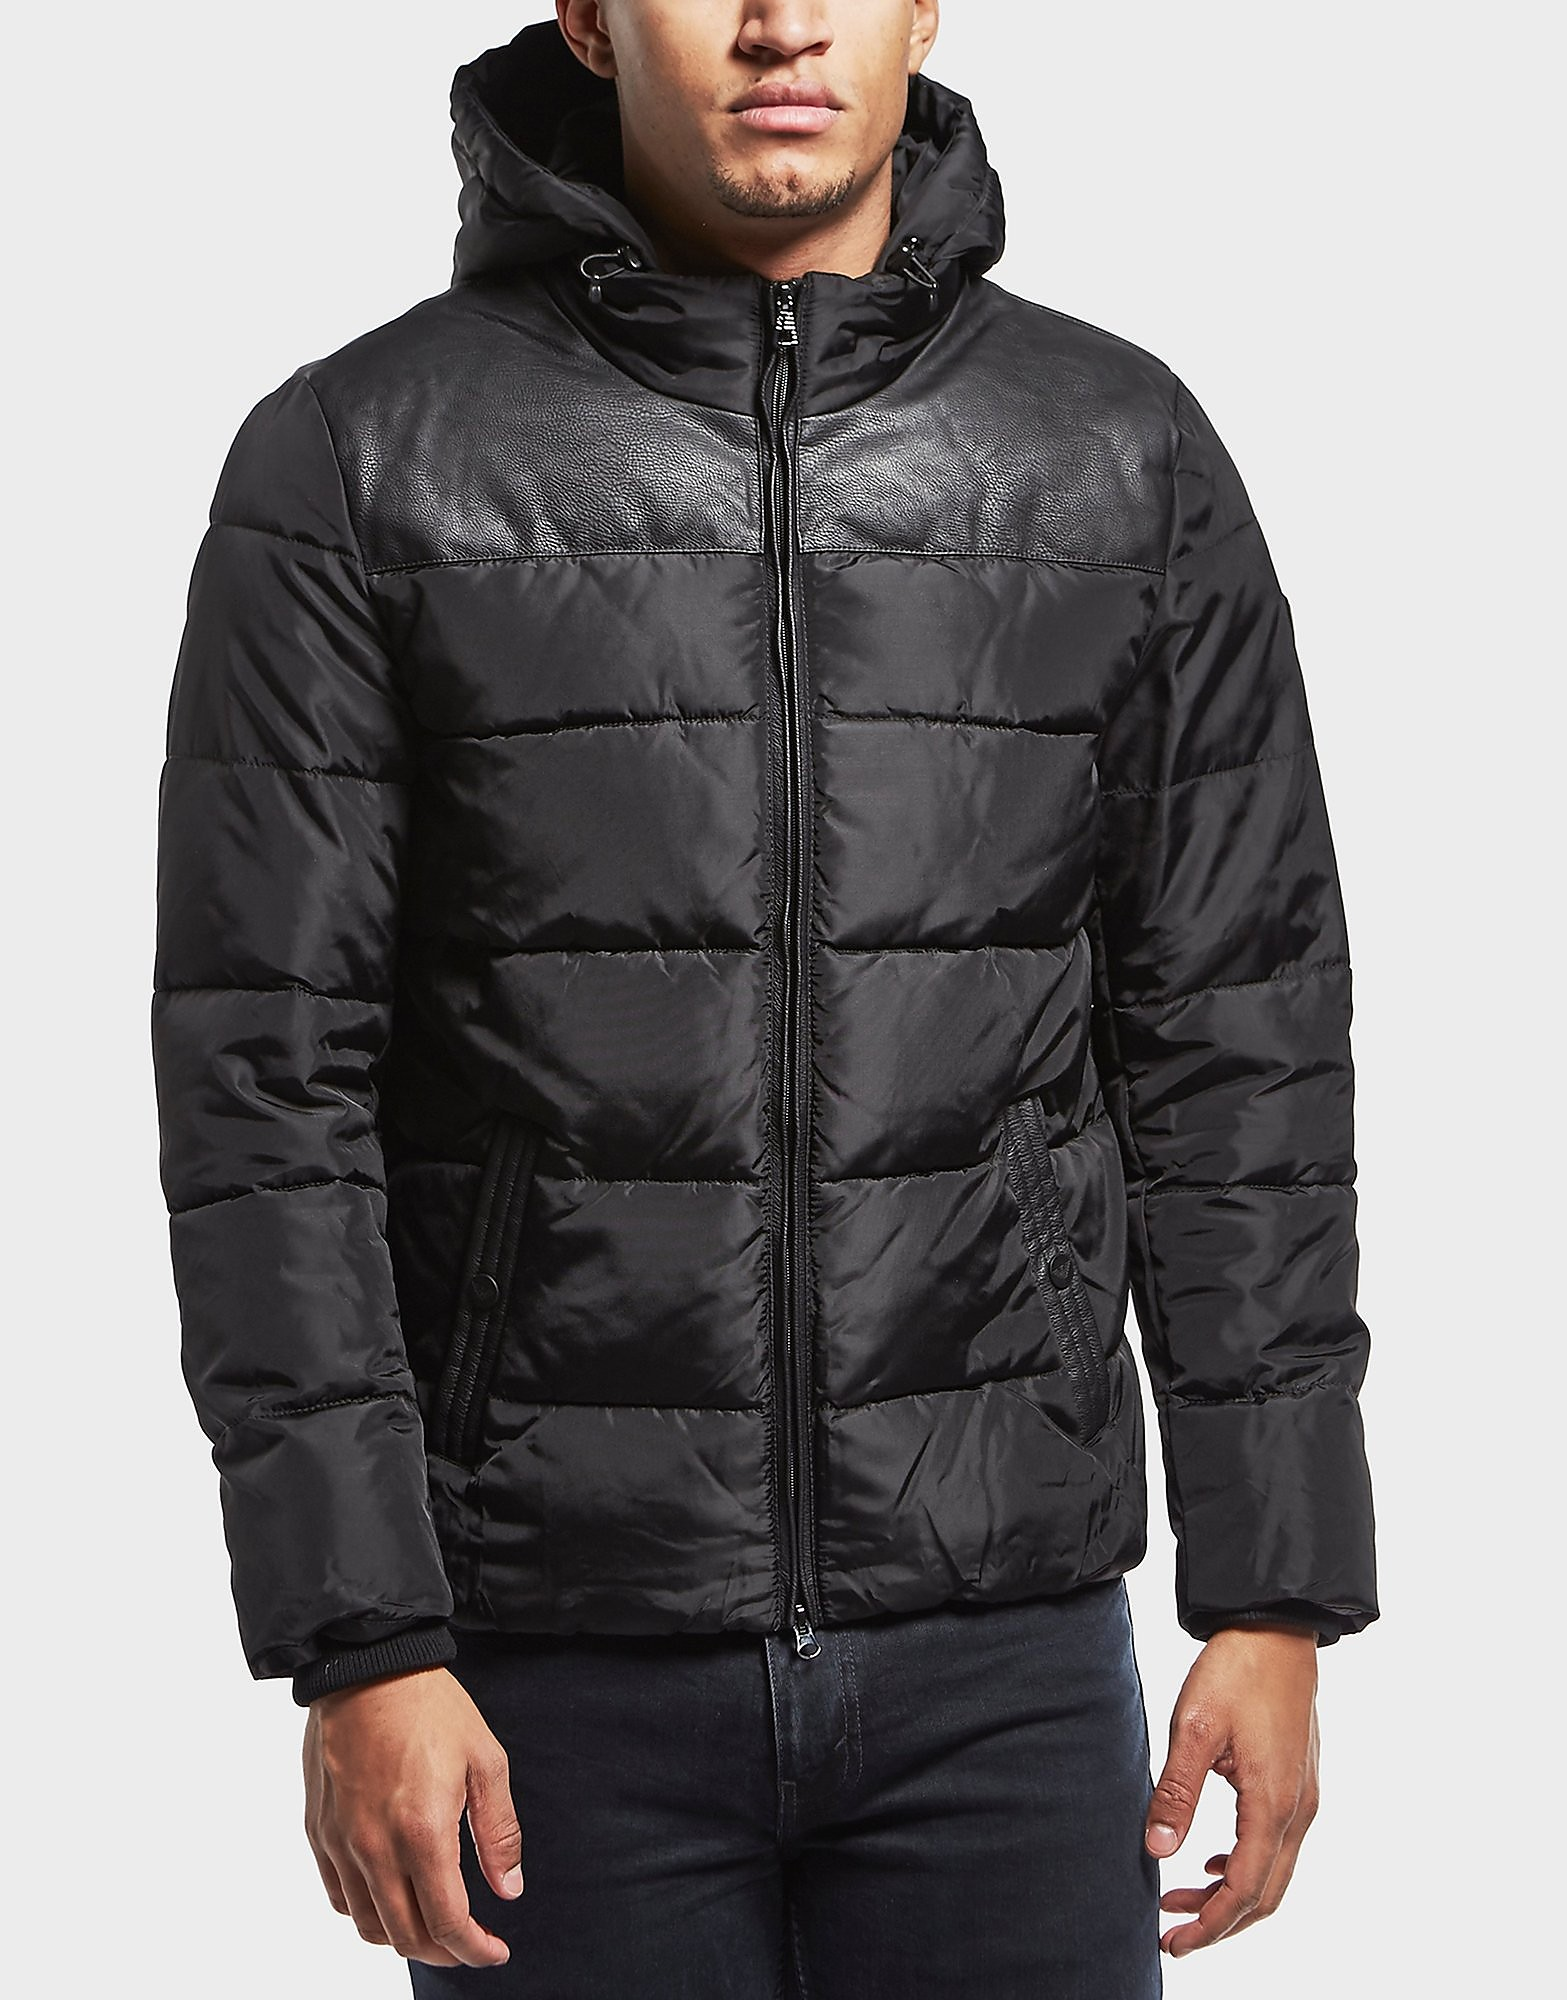 Emporio Armani EA7 Trim Padded Jacket